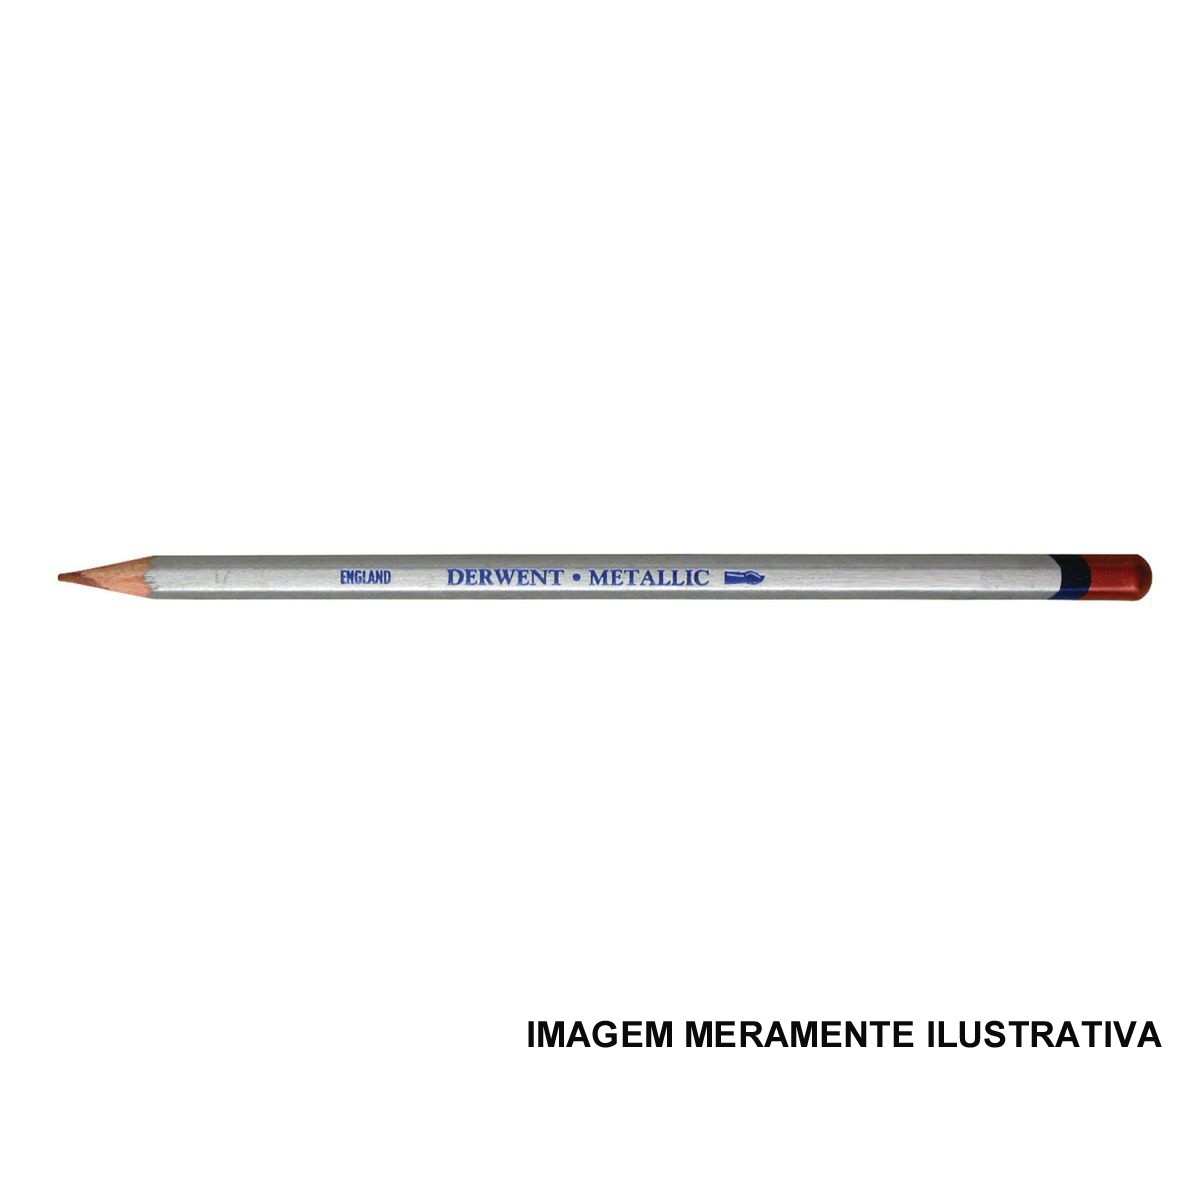 Lápis Metallic Silver (nº 01) un.